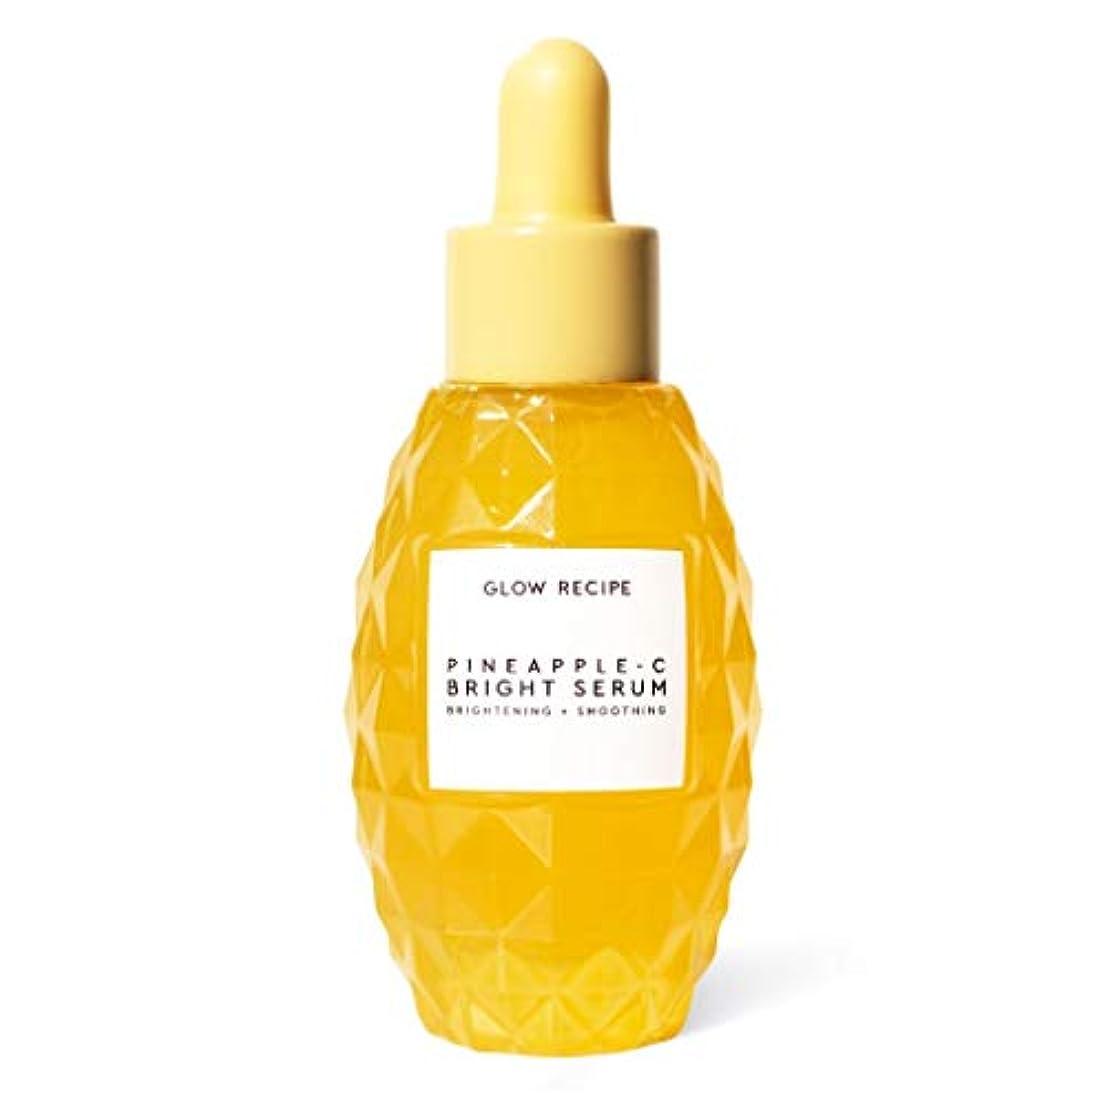 Glow Recipe Pineapple-C Brightening Serum 1 Fl. Oz/ 30ml グロウレシピ パイナップル シー ブライト二ング セラム